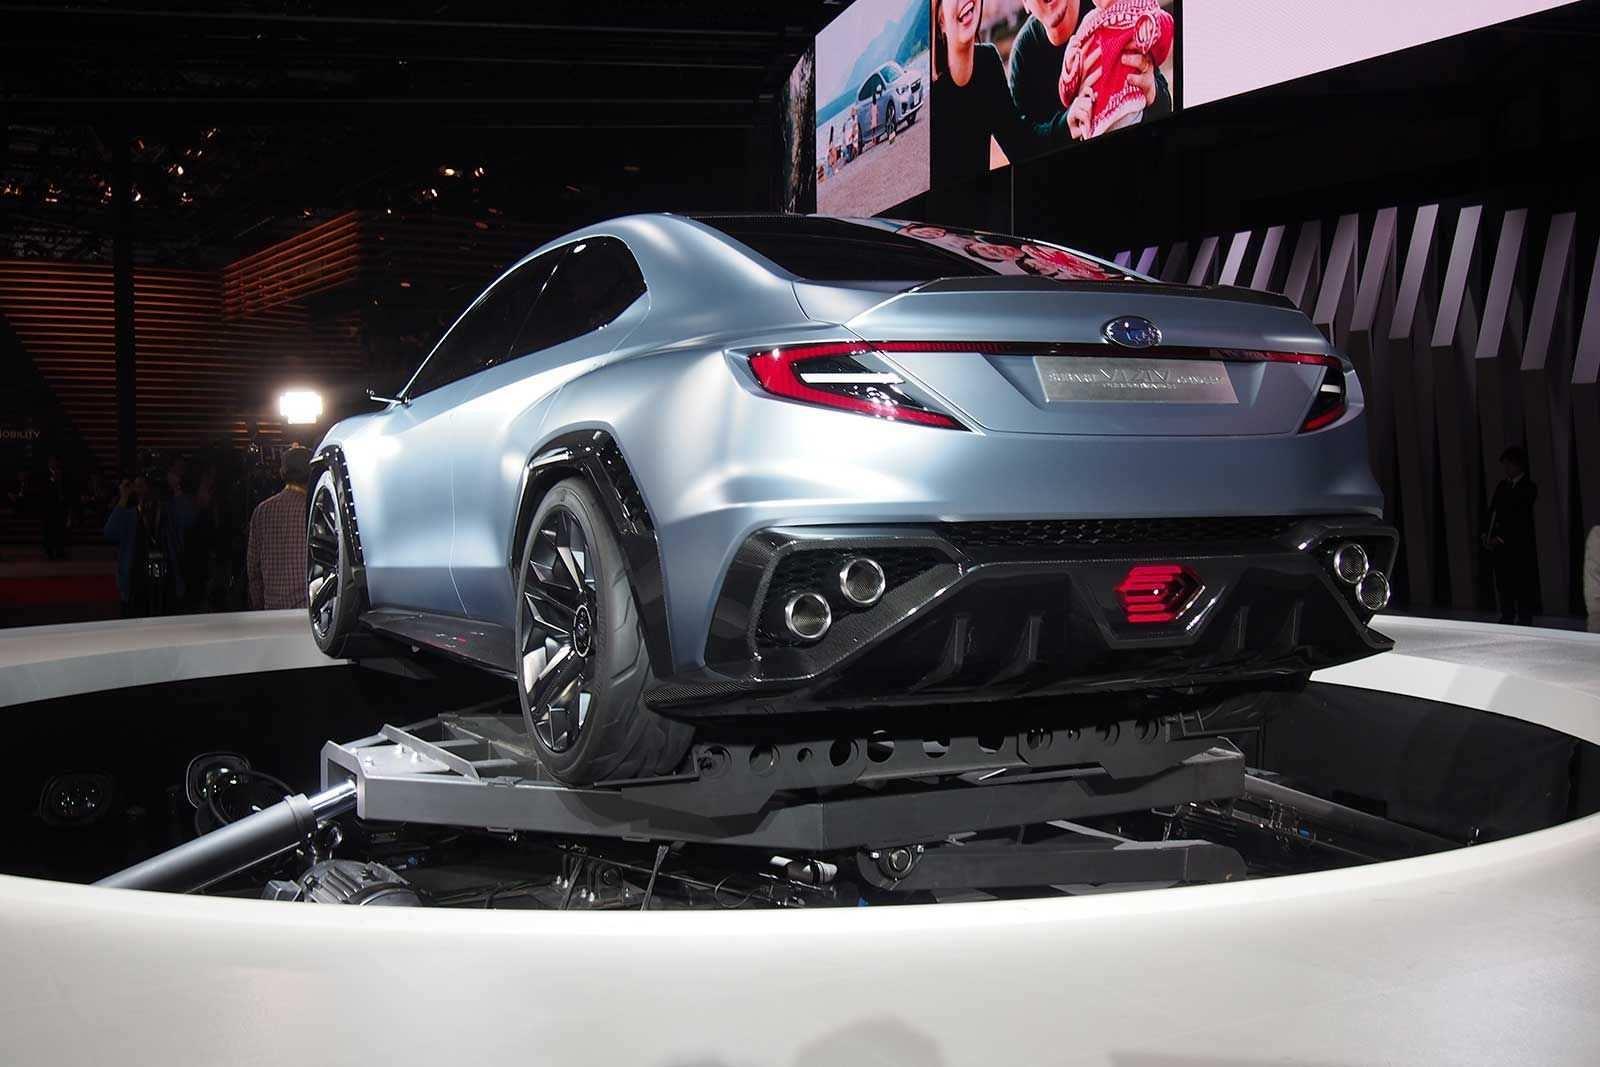 88 Concept of Subaru 2020 New New Concept Spesification for Subaru 2020 New New Concept